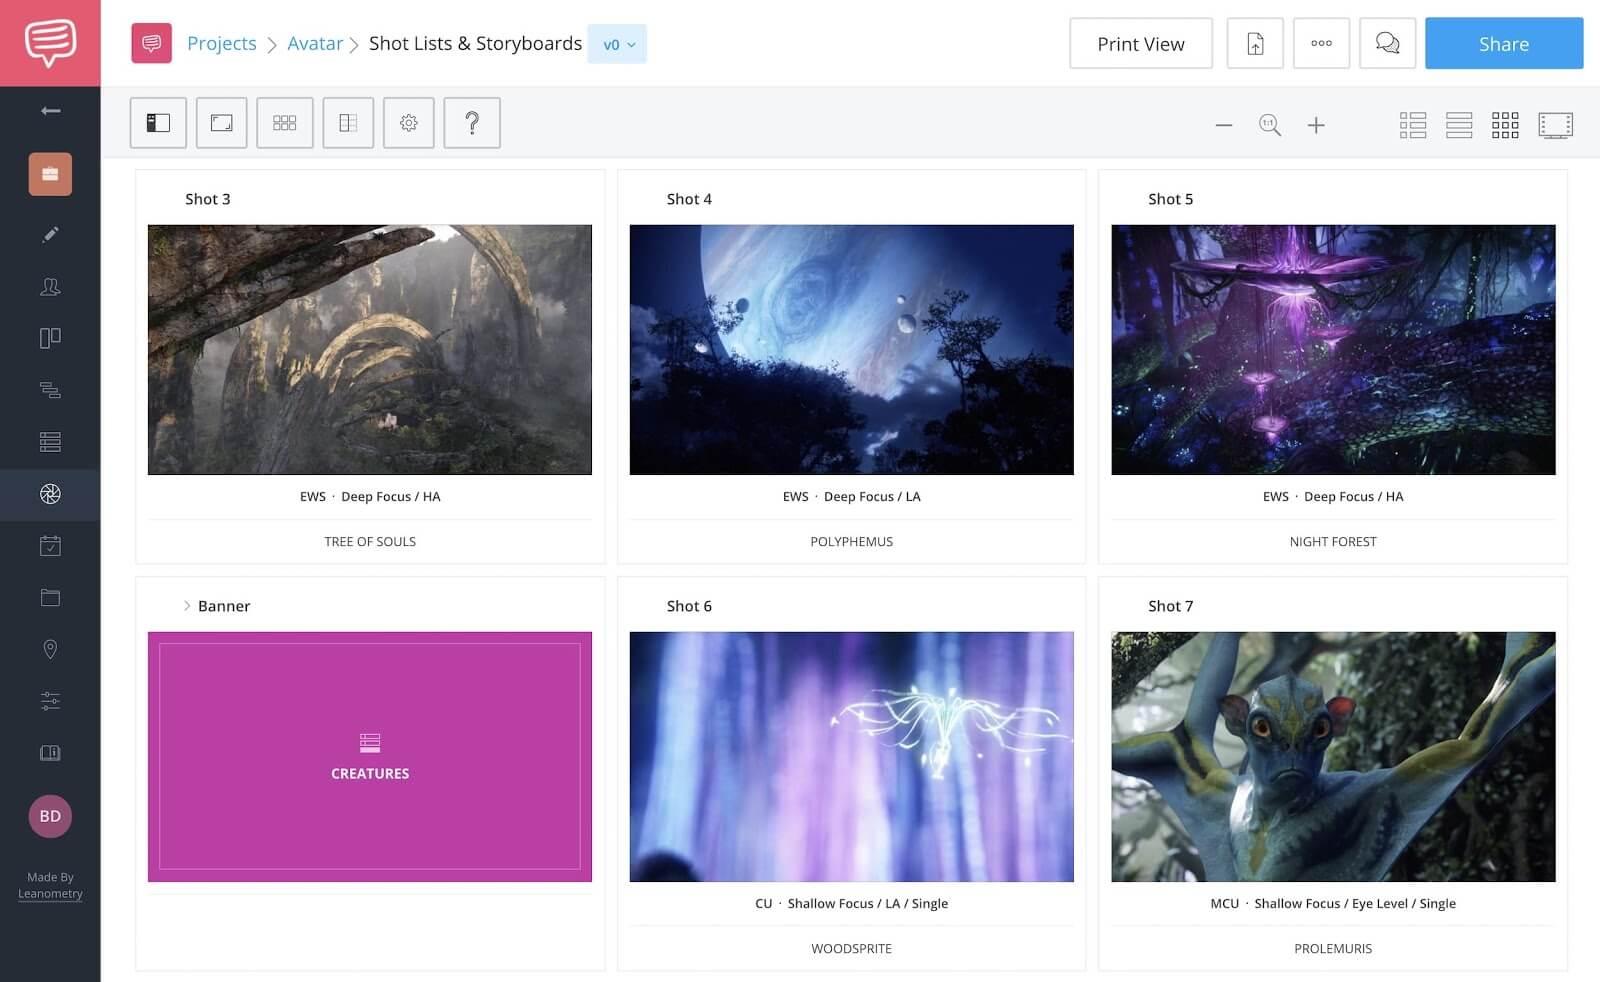 James Cameron Movies - Avatar World Building - StudioBinder Online Shot List Software